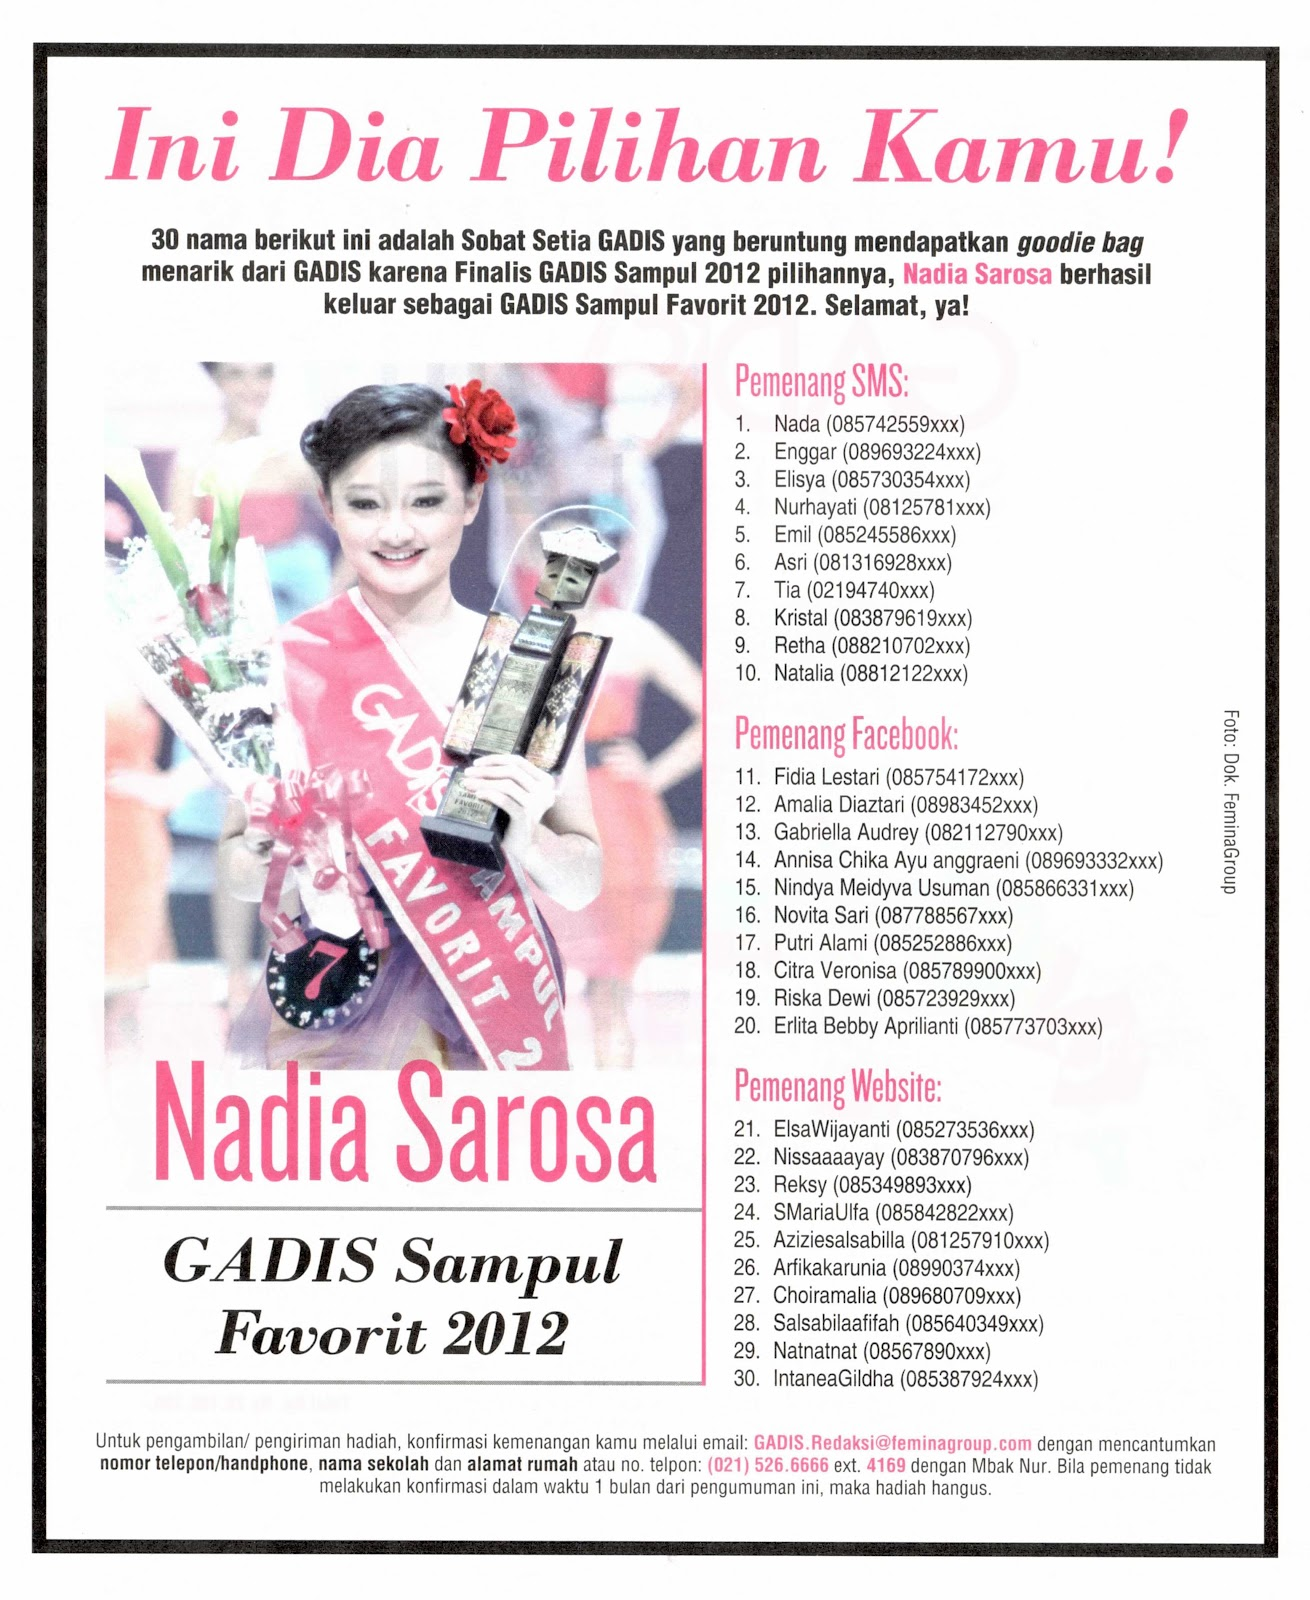 Pemenang Voting Gadis Sampul Favorit 2012